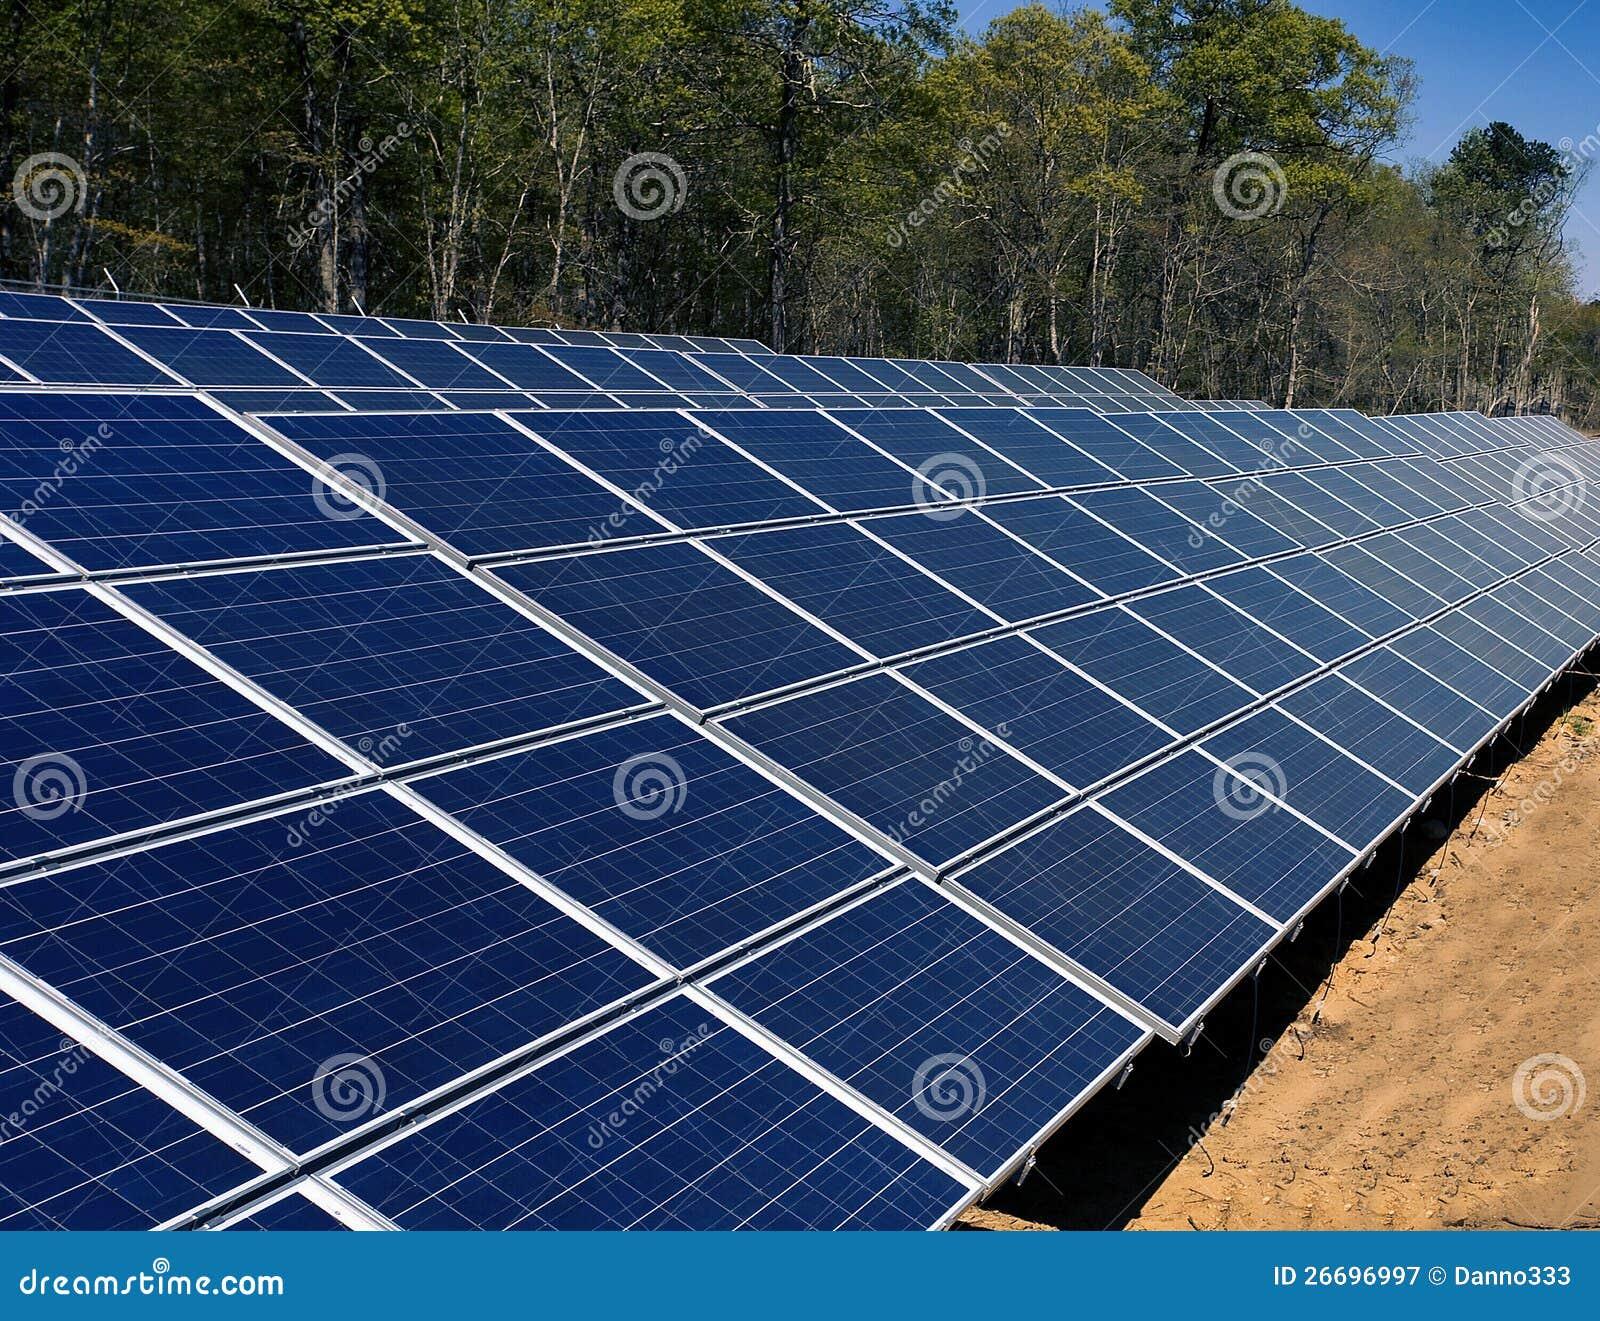 solar panel background - photo #31